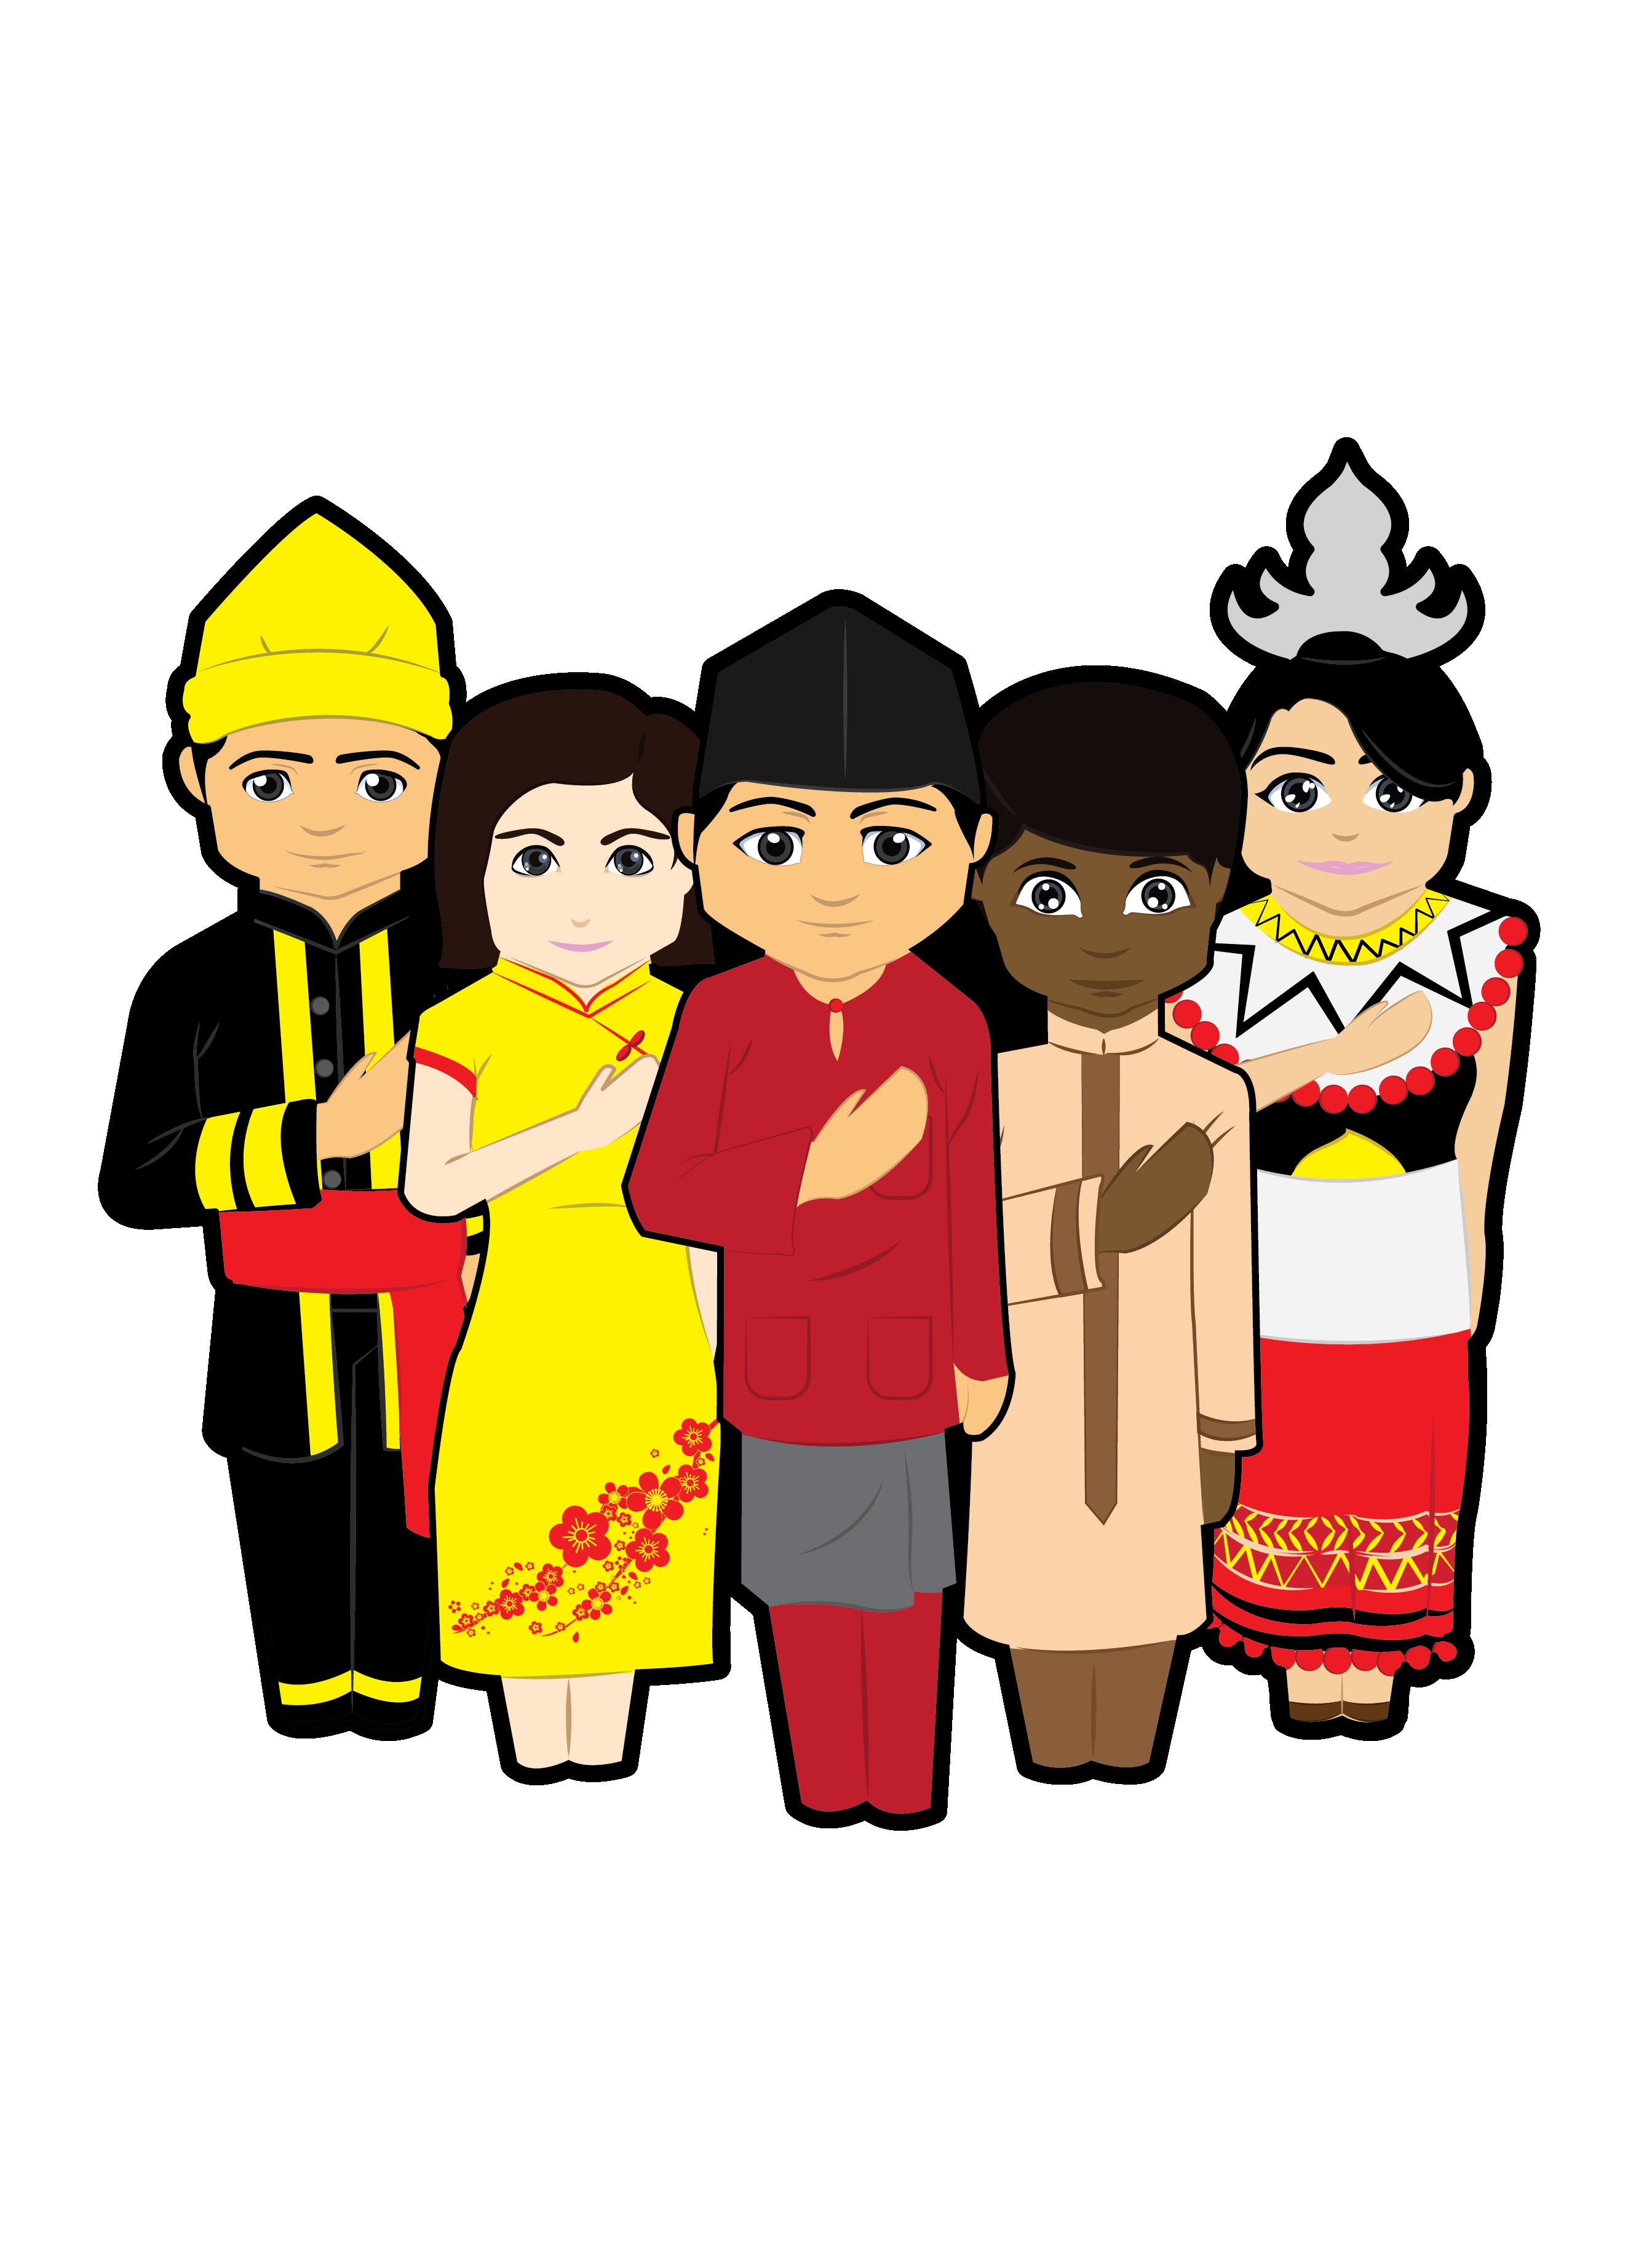 MALAYSIAN + CULTURE | MY ARTWORK | Character design, Logo